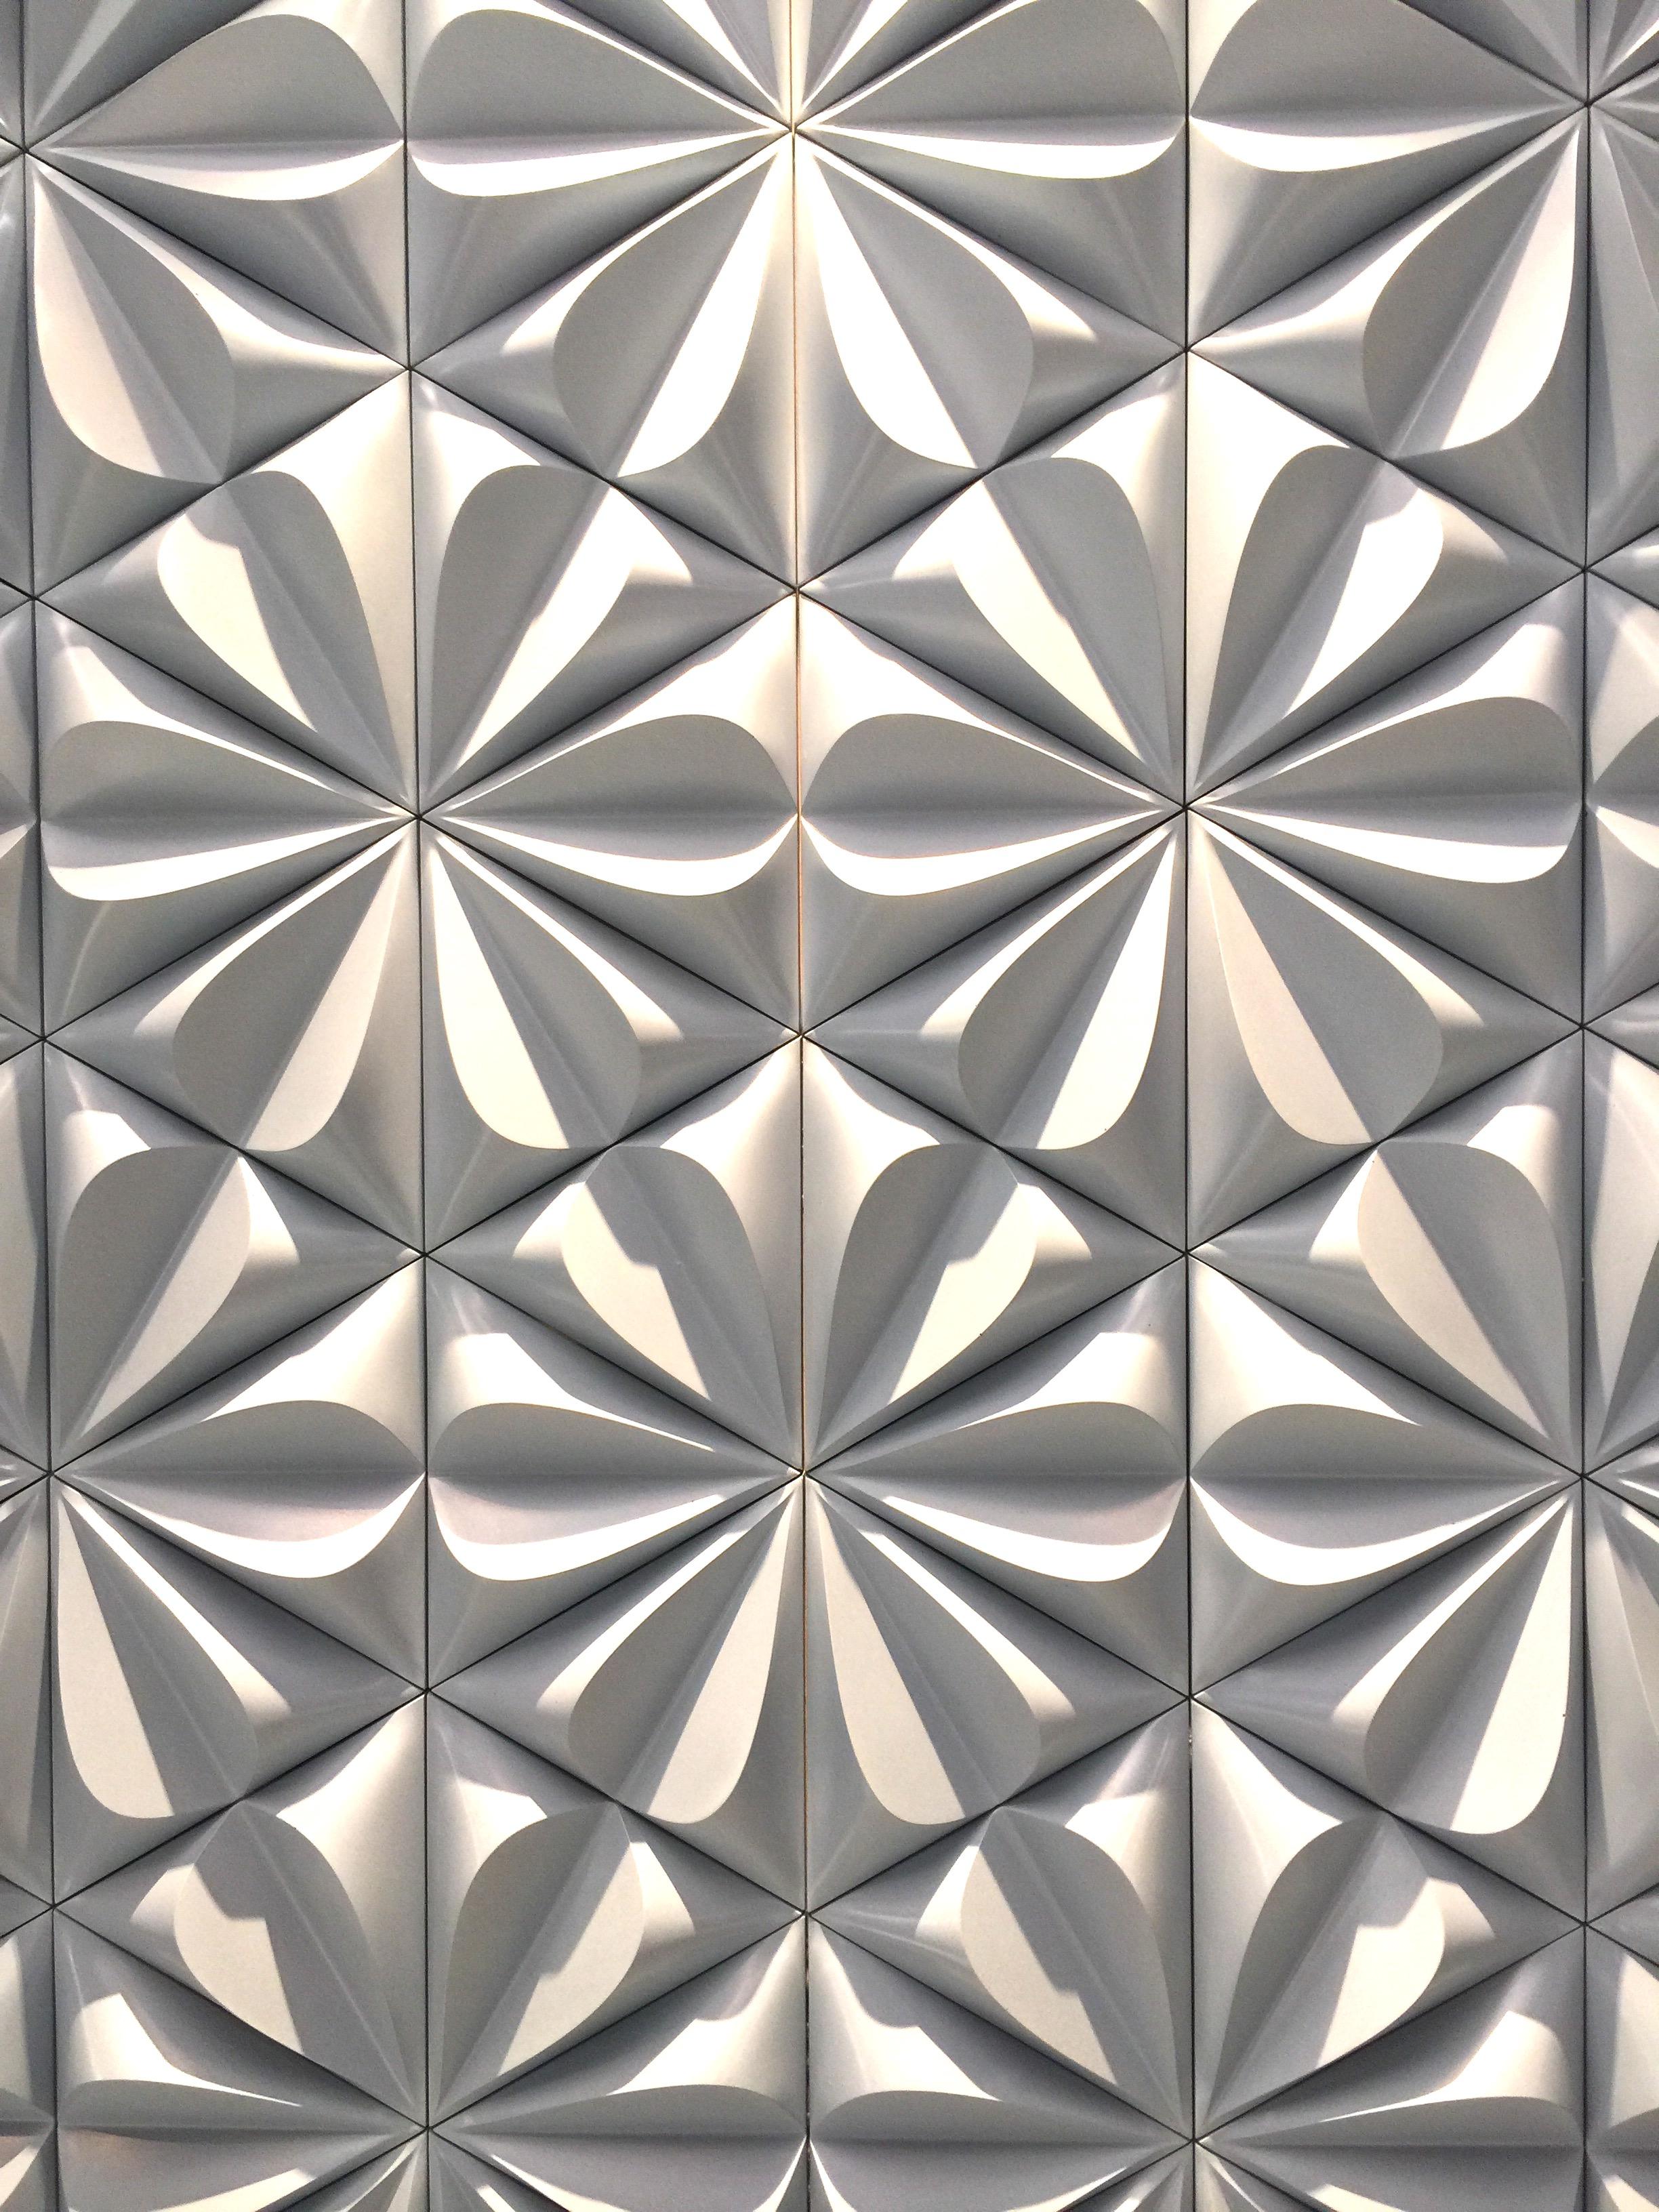 Walker Zanger's Kaza collection tile, seen at KBIS 2016